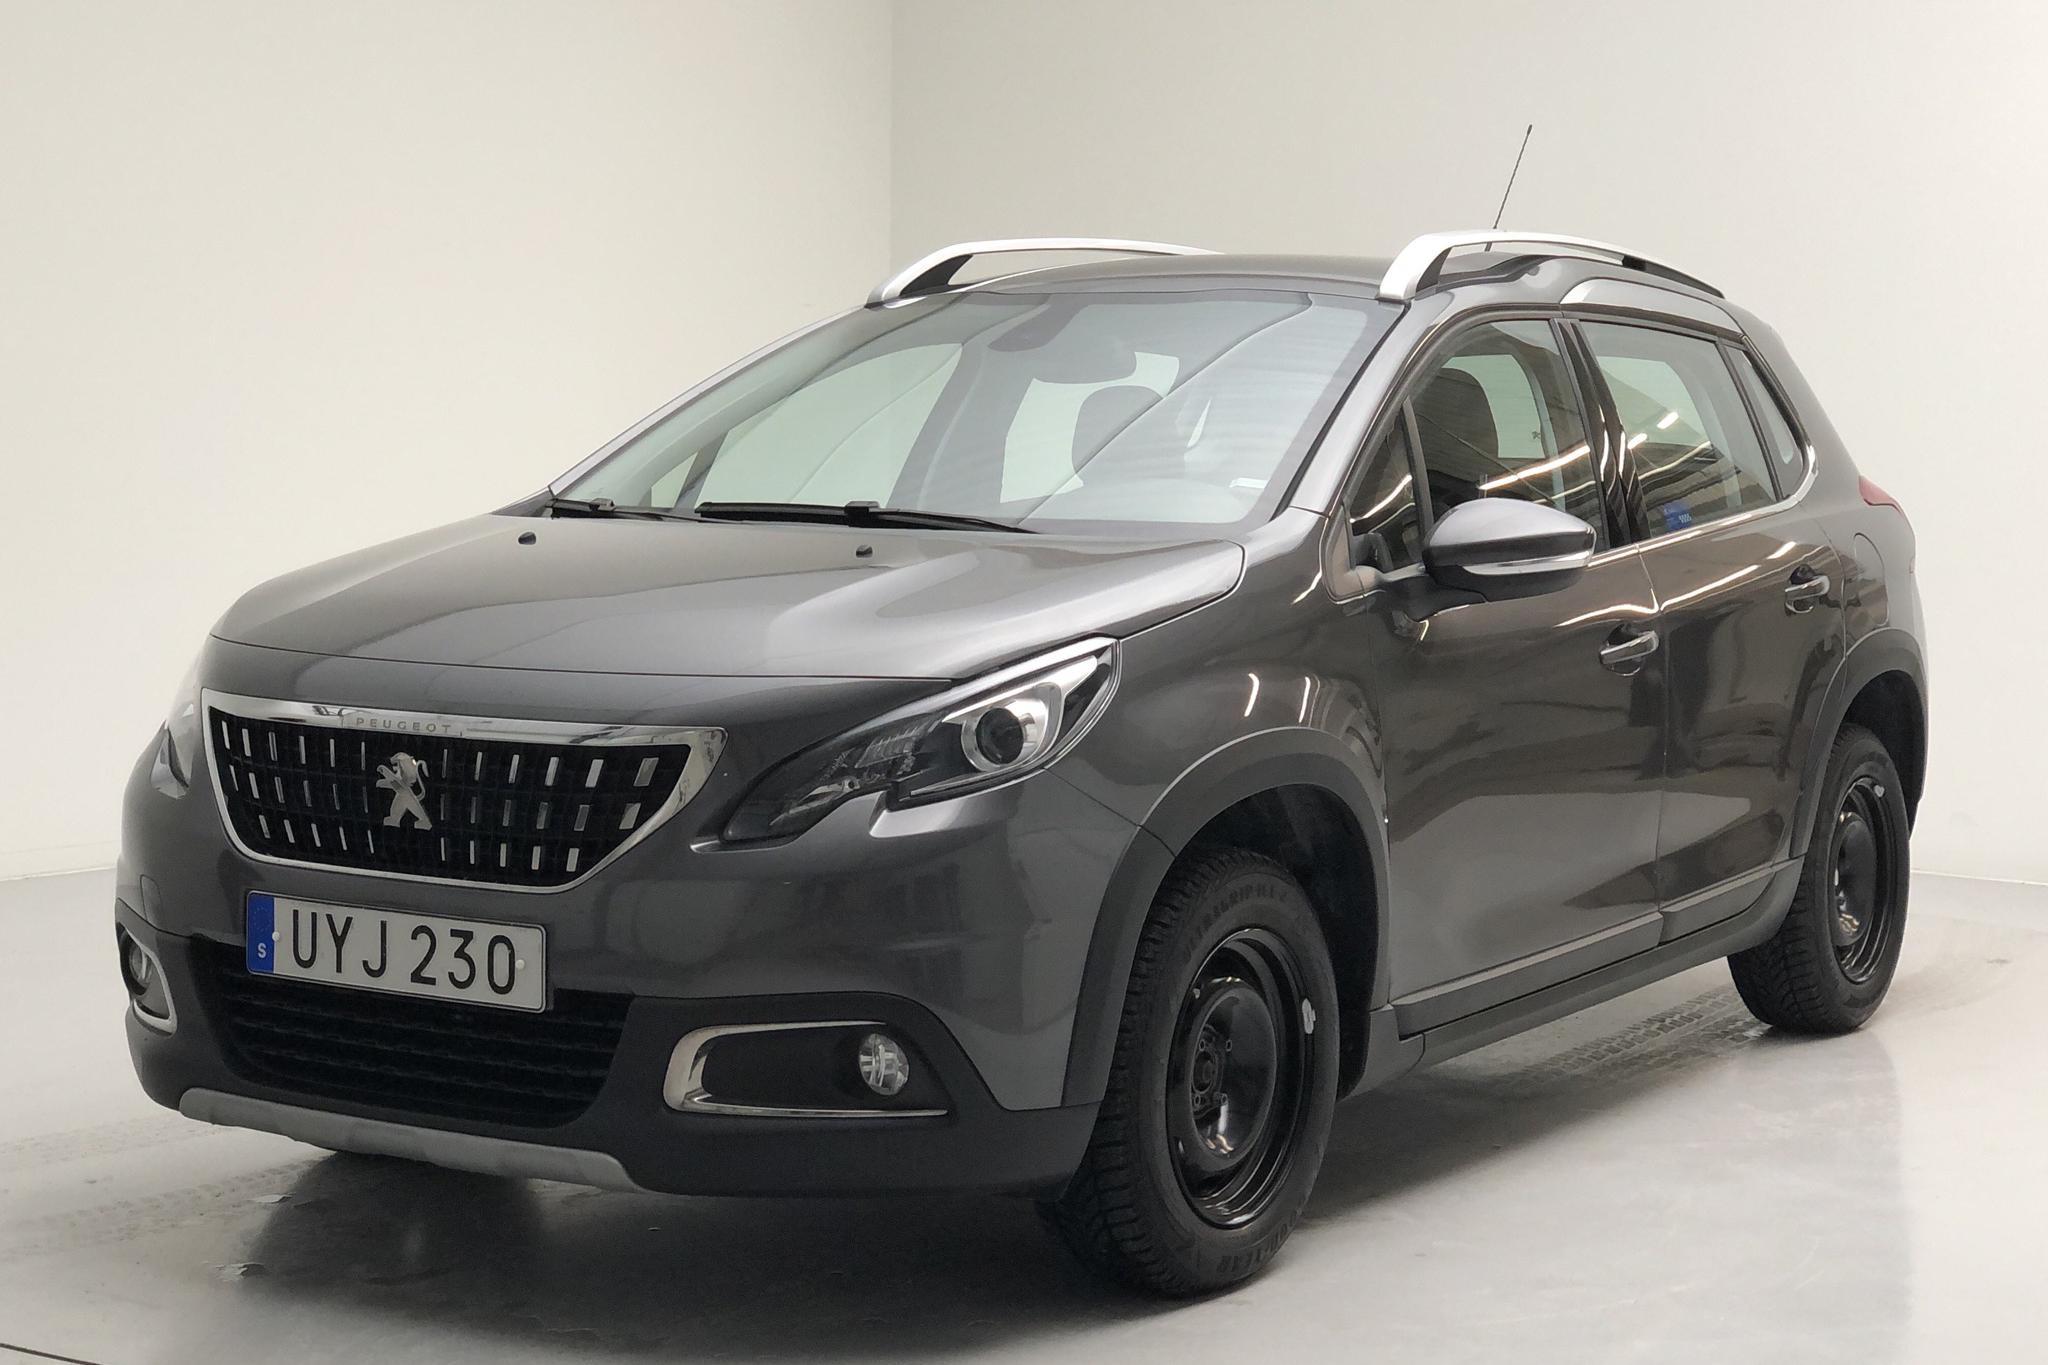 Peugeot 2008 1.2 VTi (82hk) - 3 302 mil - Manuell - Dark Grey - 2018